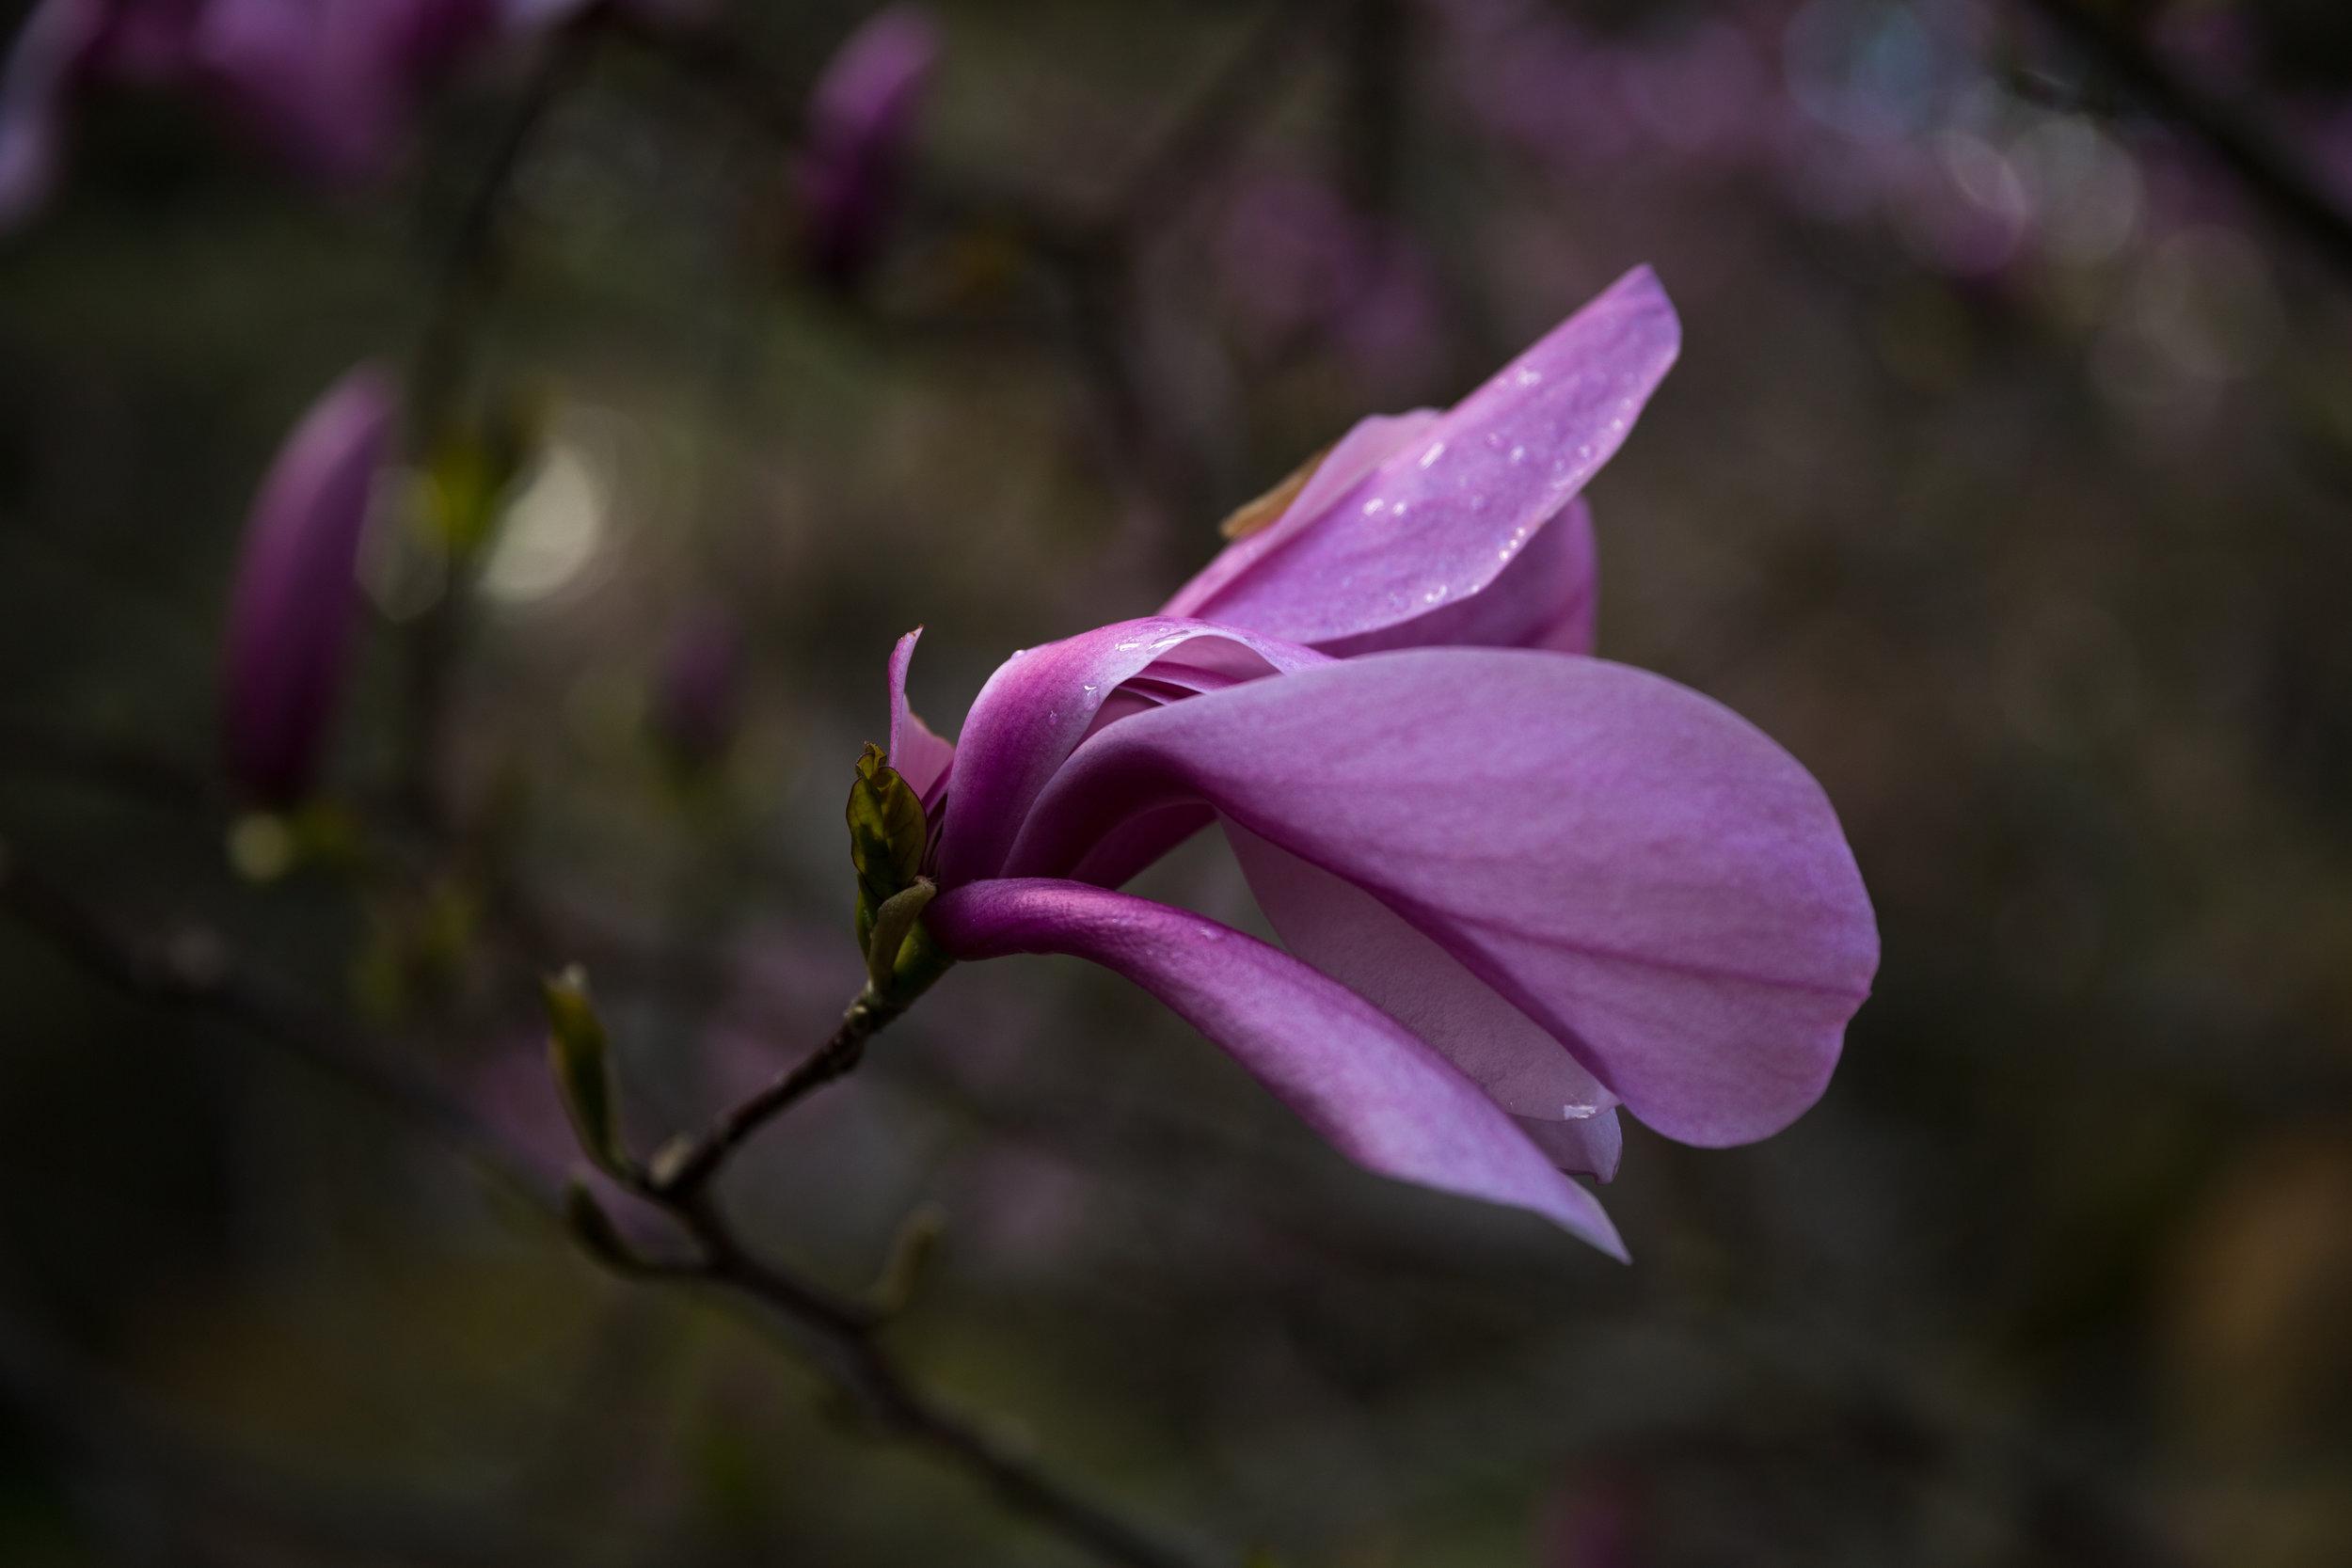 4 april 12th 2018 point defiance flowers flowering trees 5 stars-125.jpg